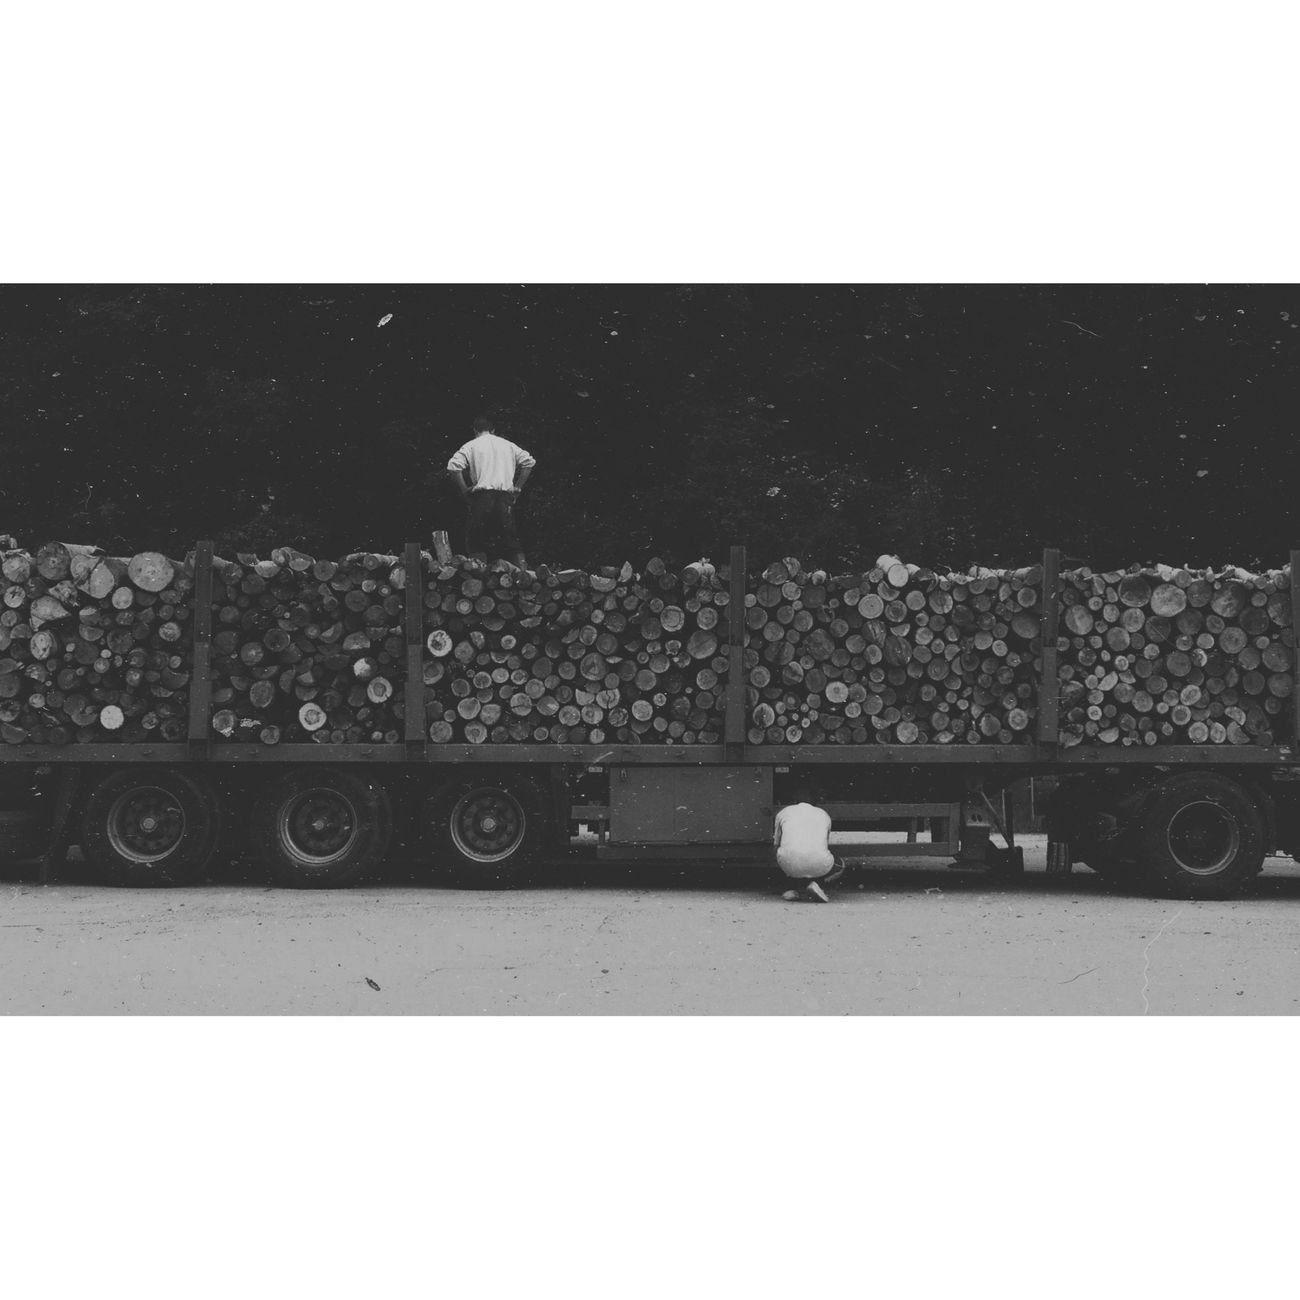 AMPt_community Streetphoto_bw Black And White Blackandwhite